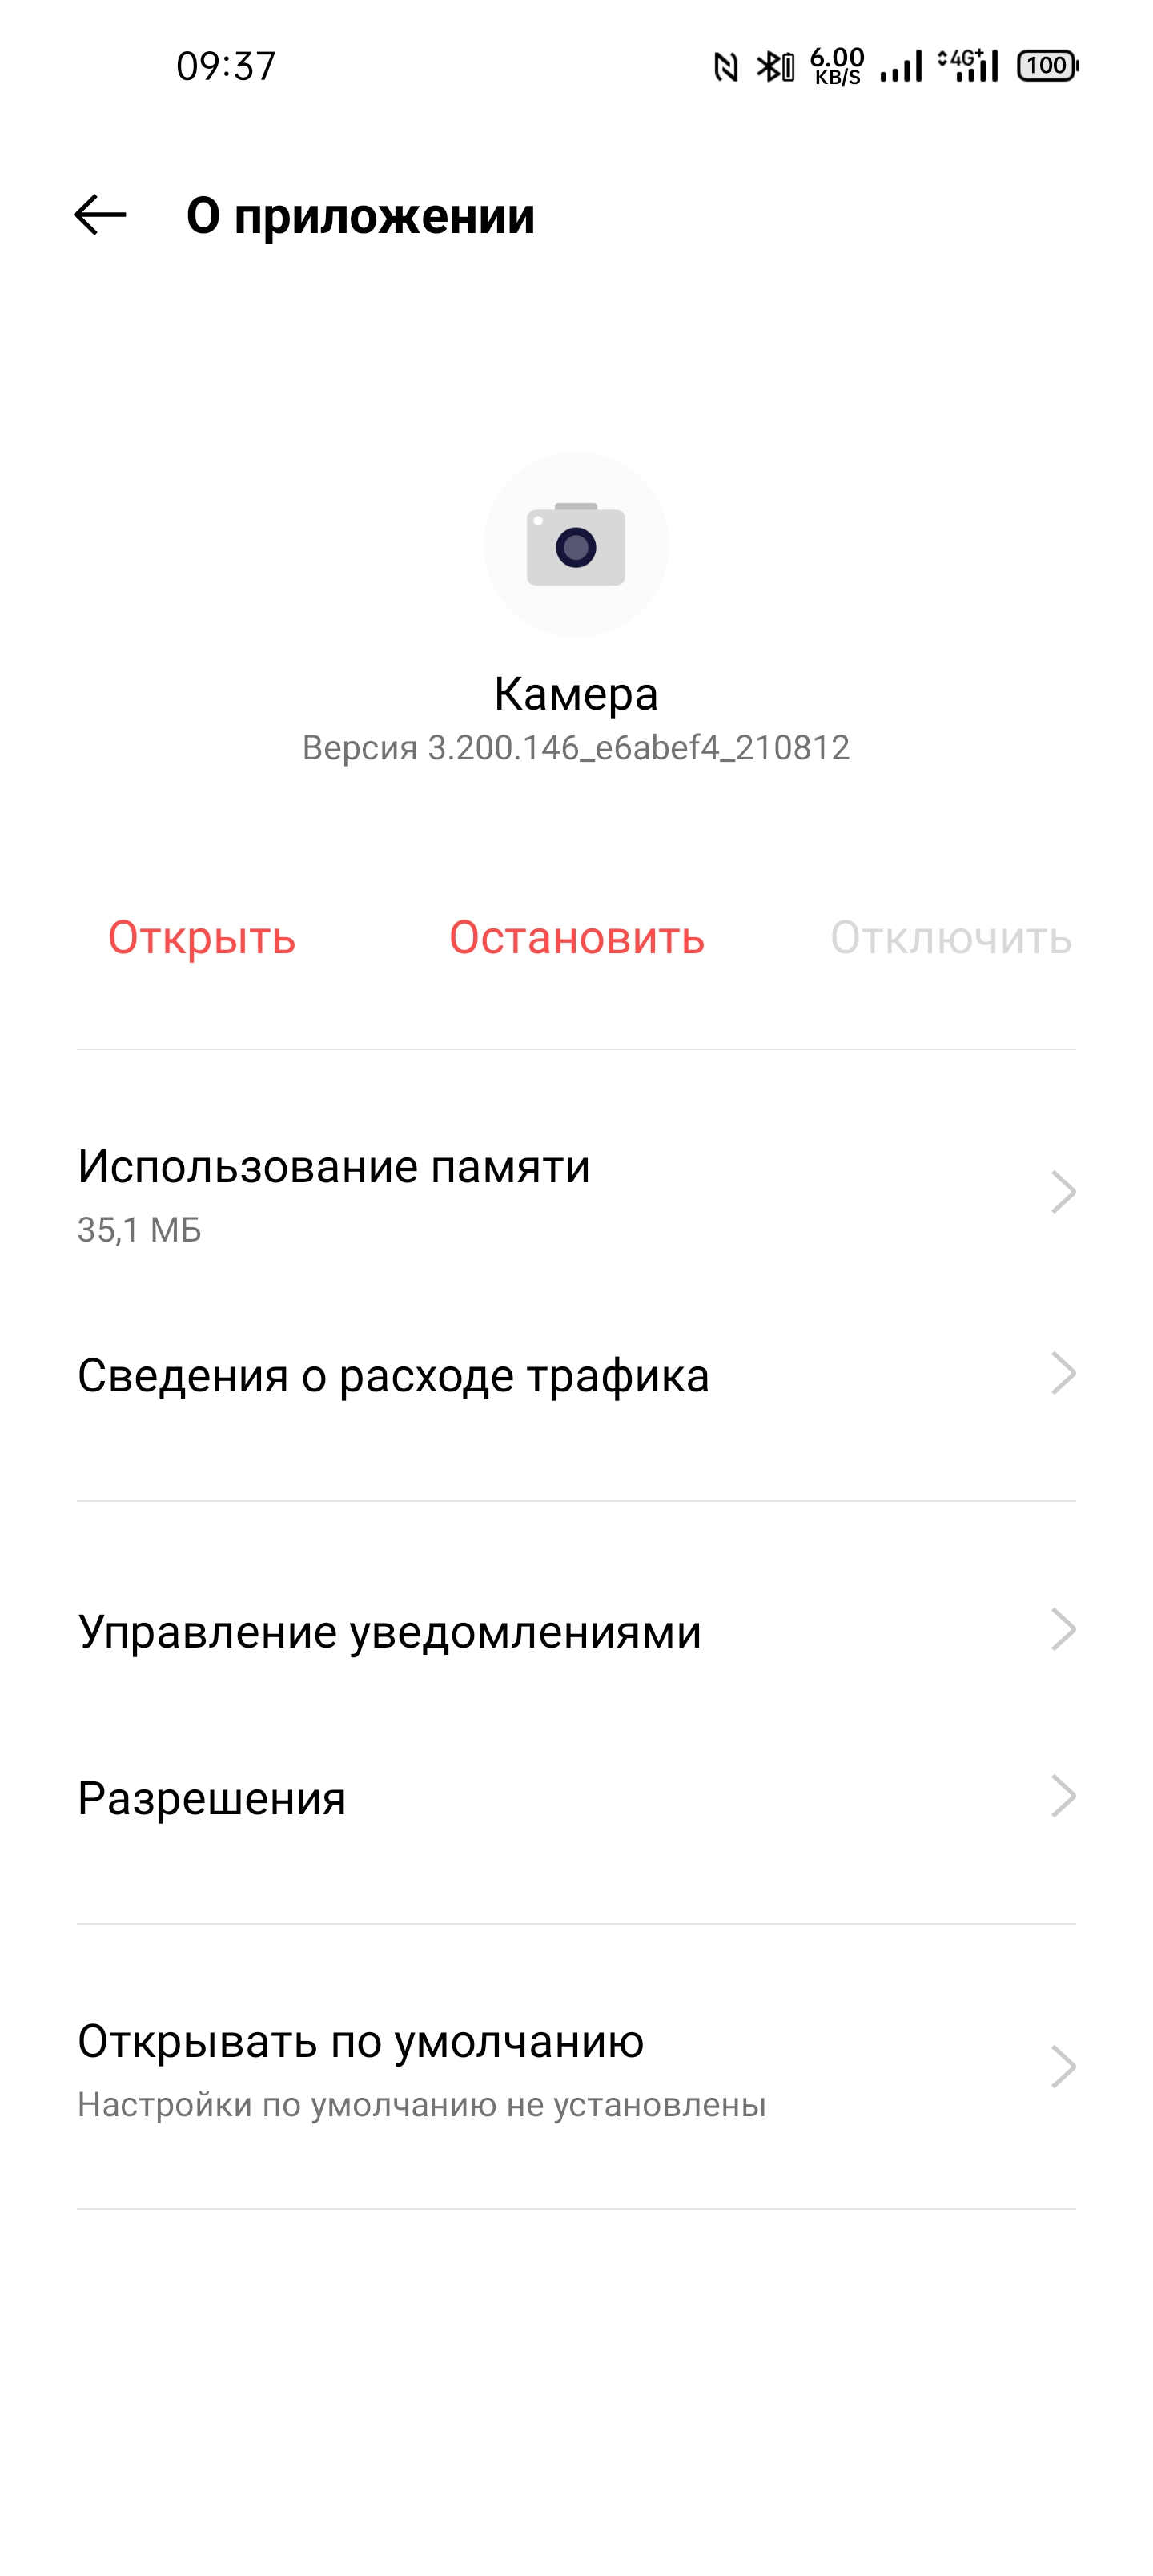 Screenshot_2021-09-03-09-37-13-27_fc704e6b13c4fb26bf5e411f75da84f2.jpg